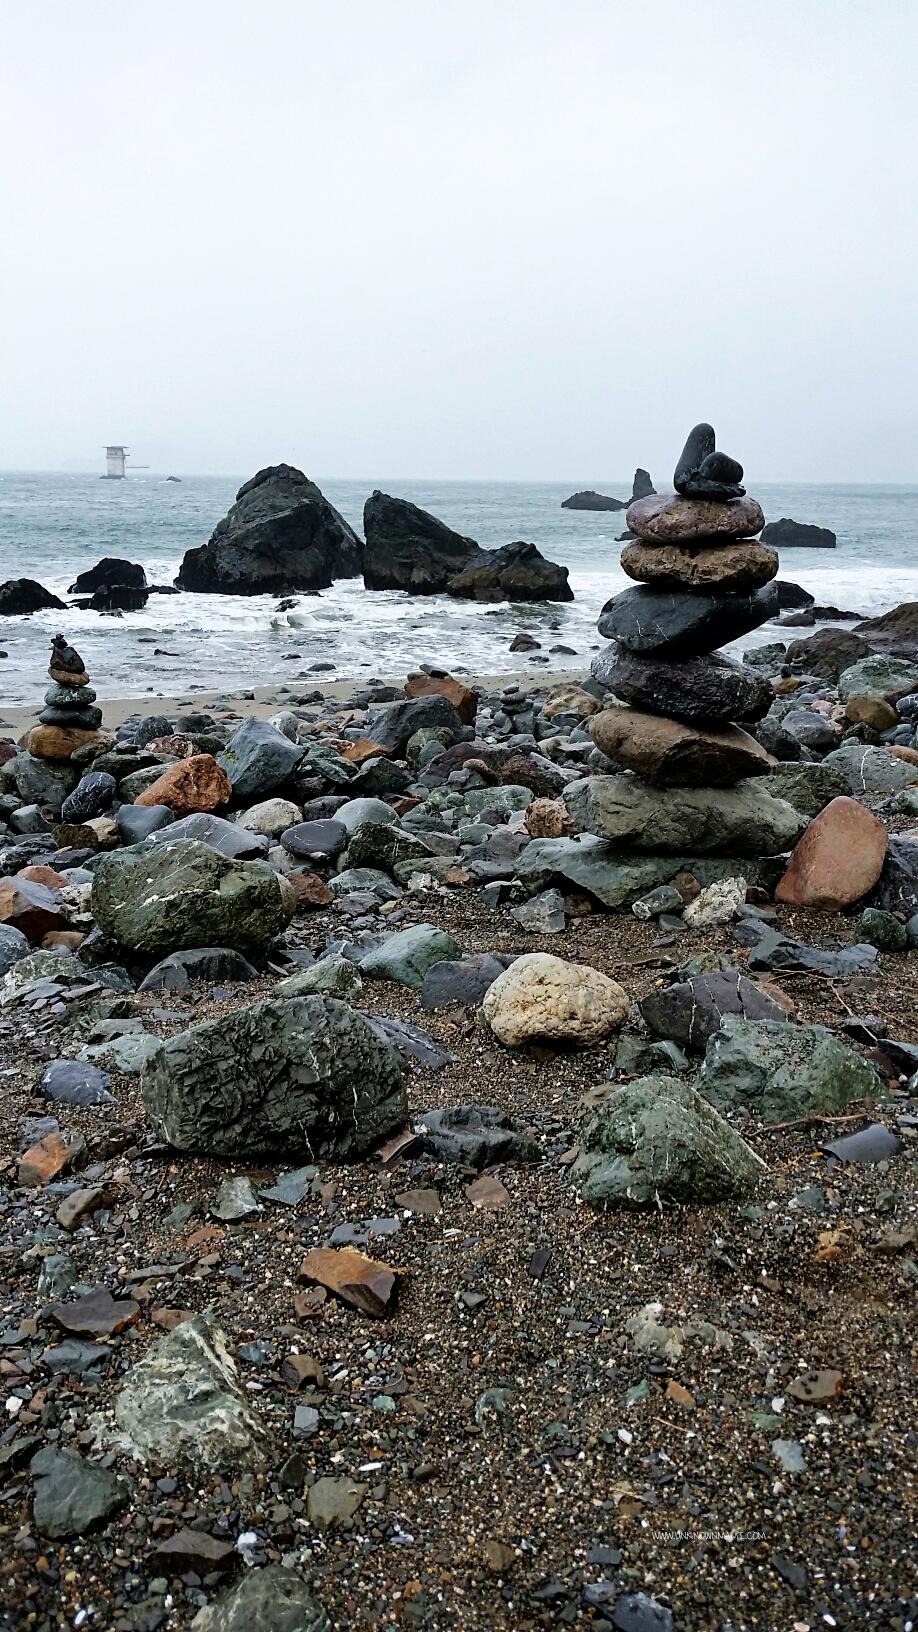 Stacked Rocks at Lands End